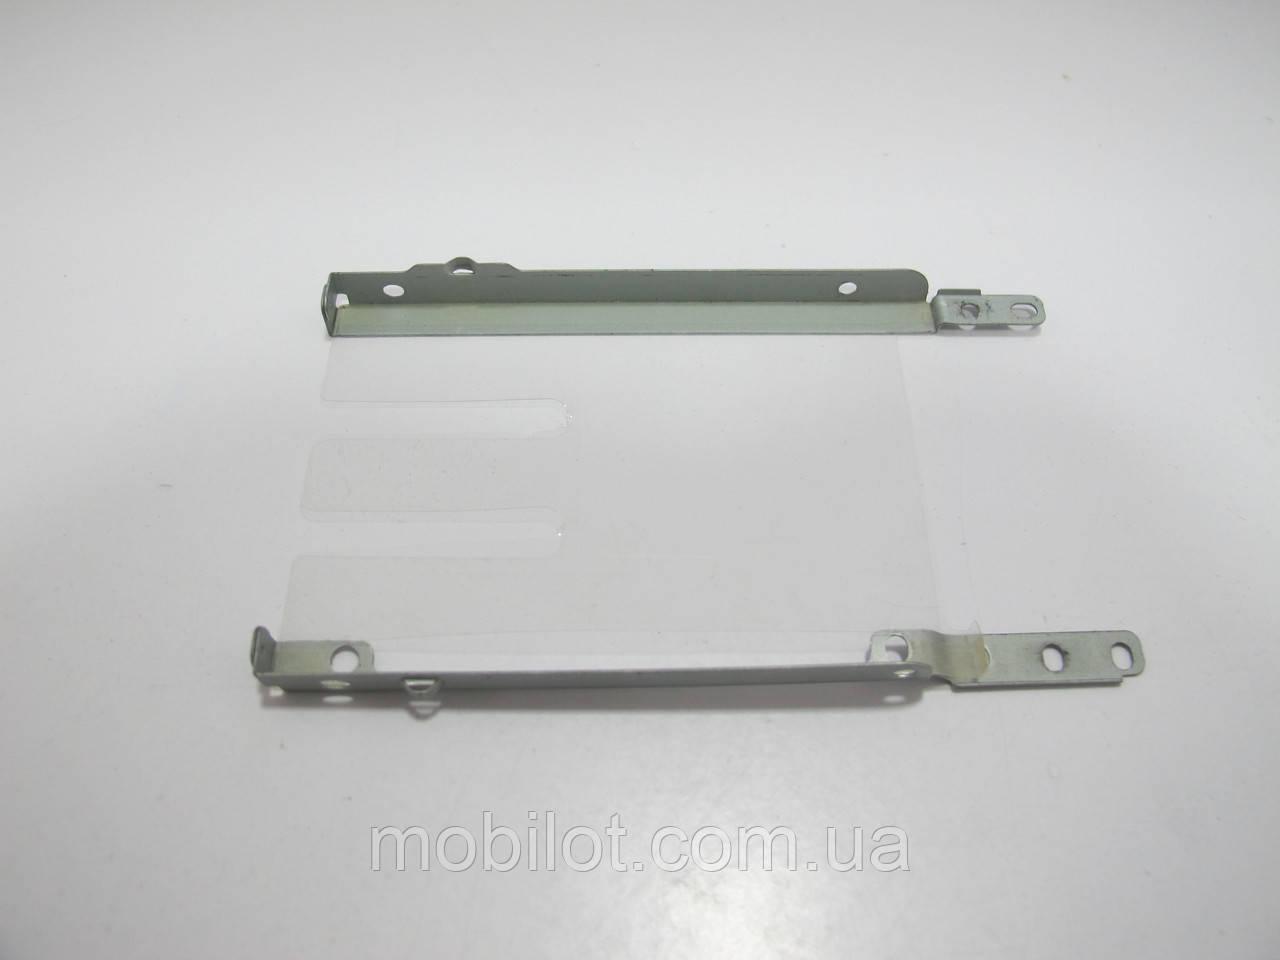 Корпус (карман, корзина, крепление) для HDD Acer 5733 (NZ-4566)